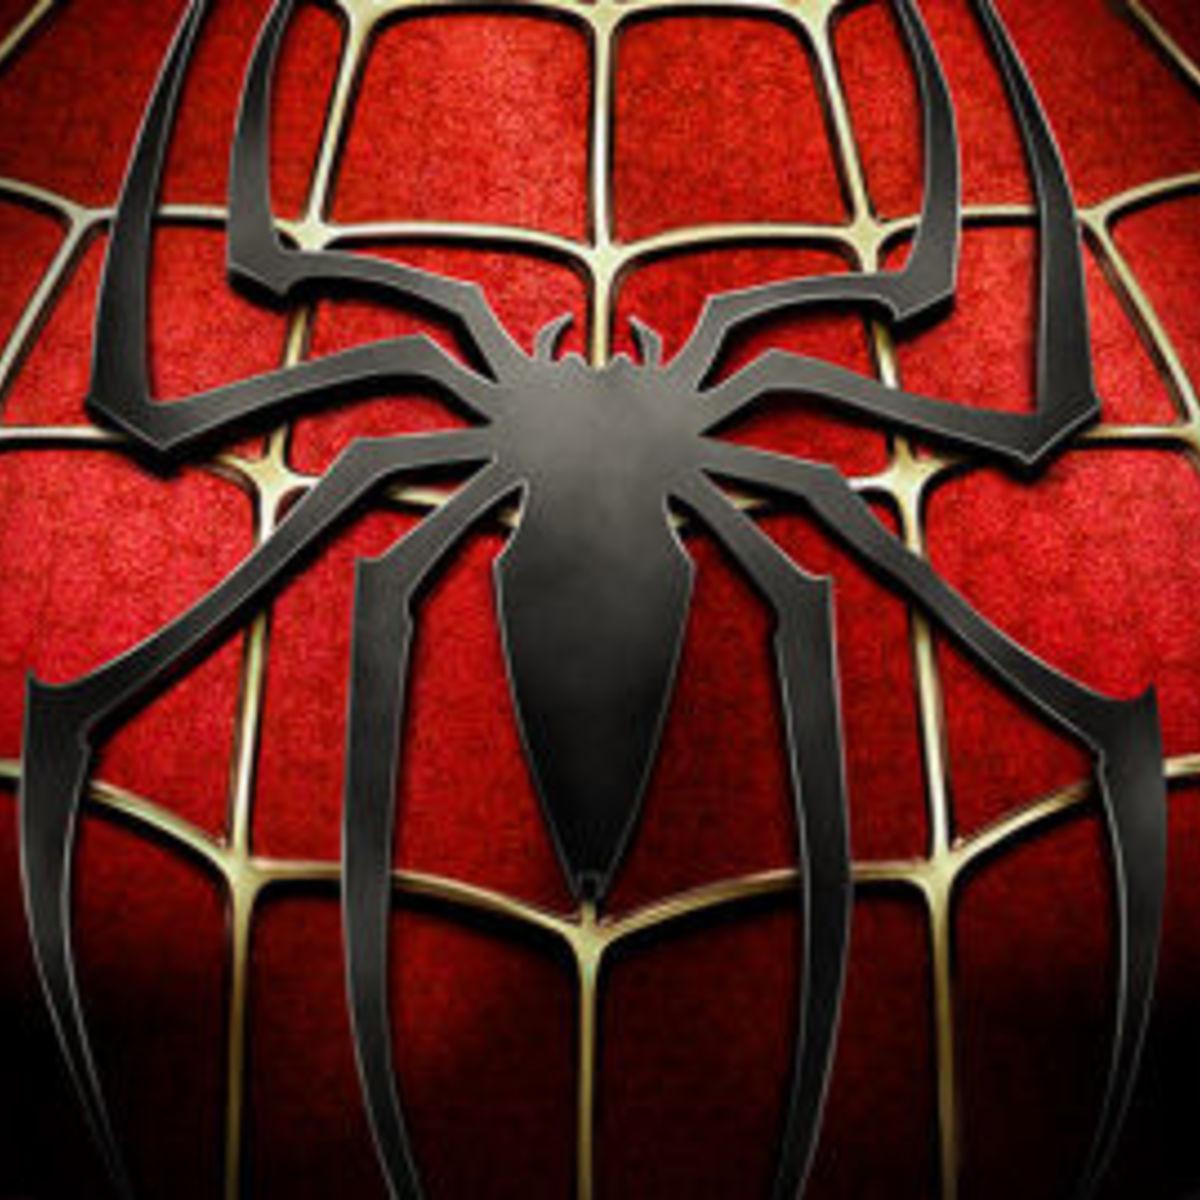 SpiderMan_logo_10.jpg